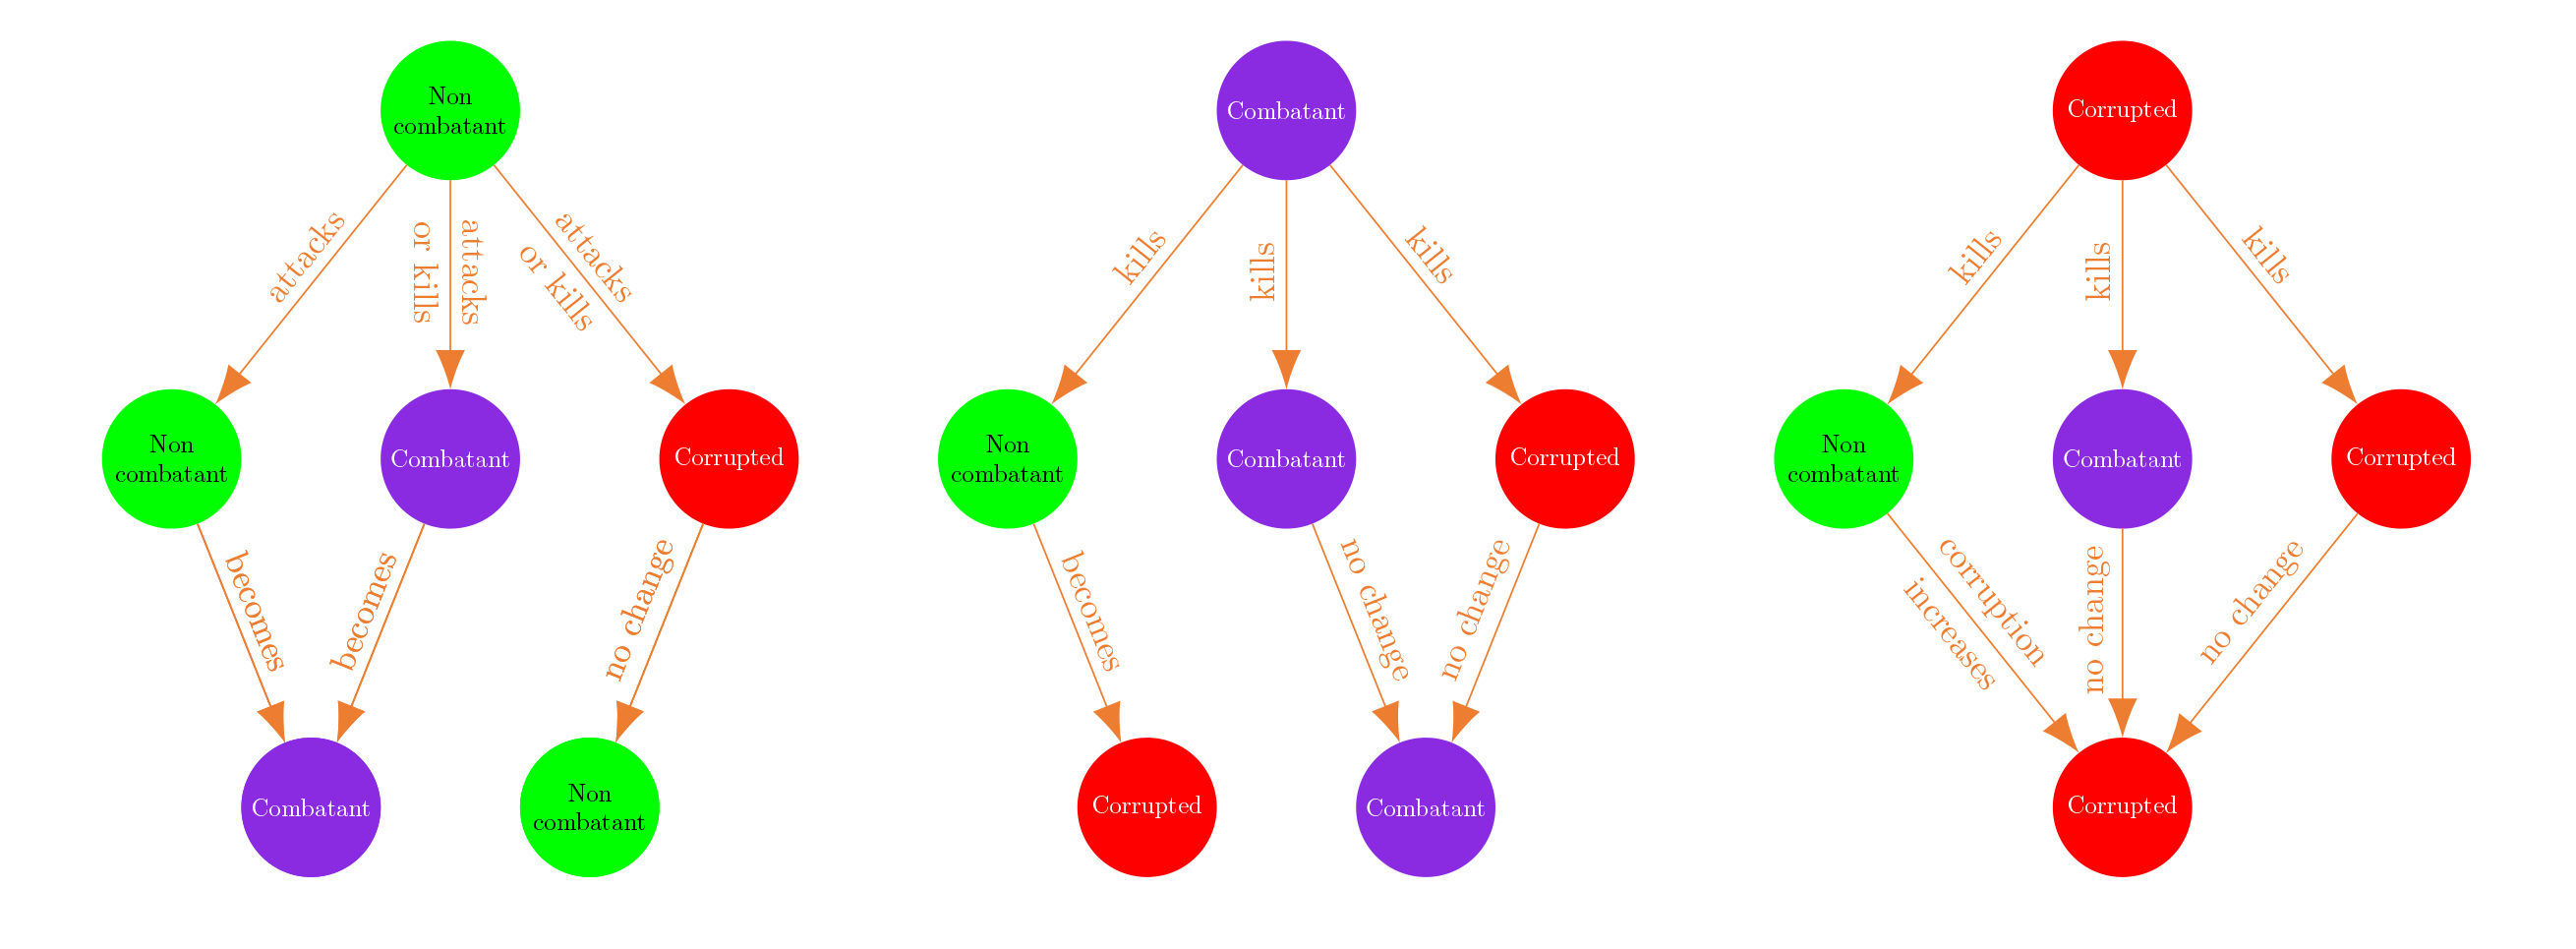 20200908160519pvp_flagging_diagram